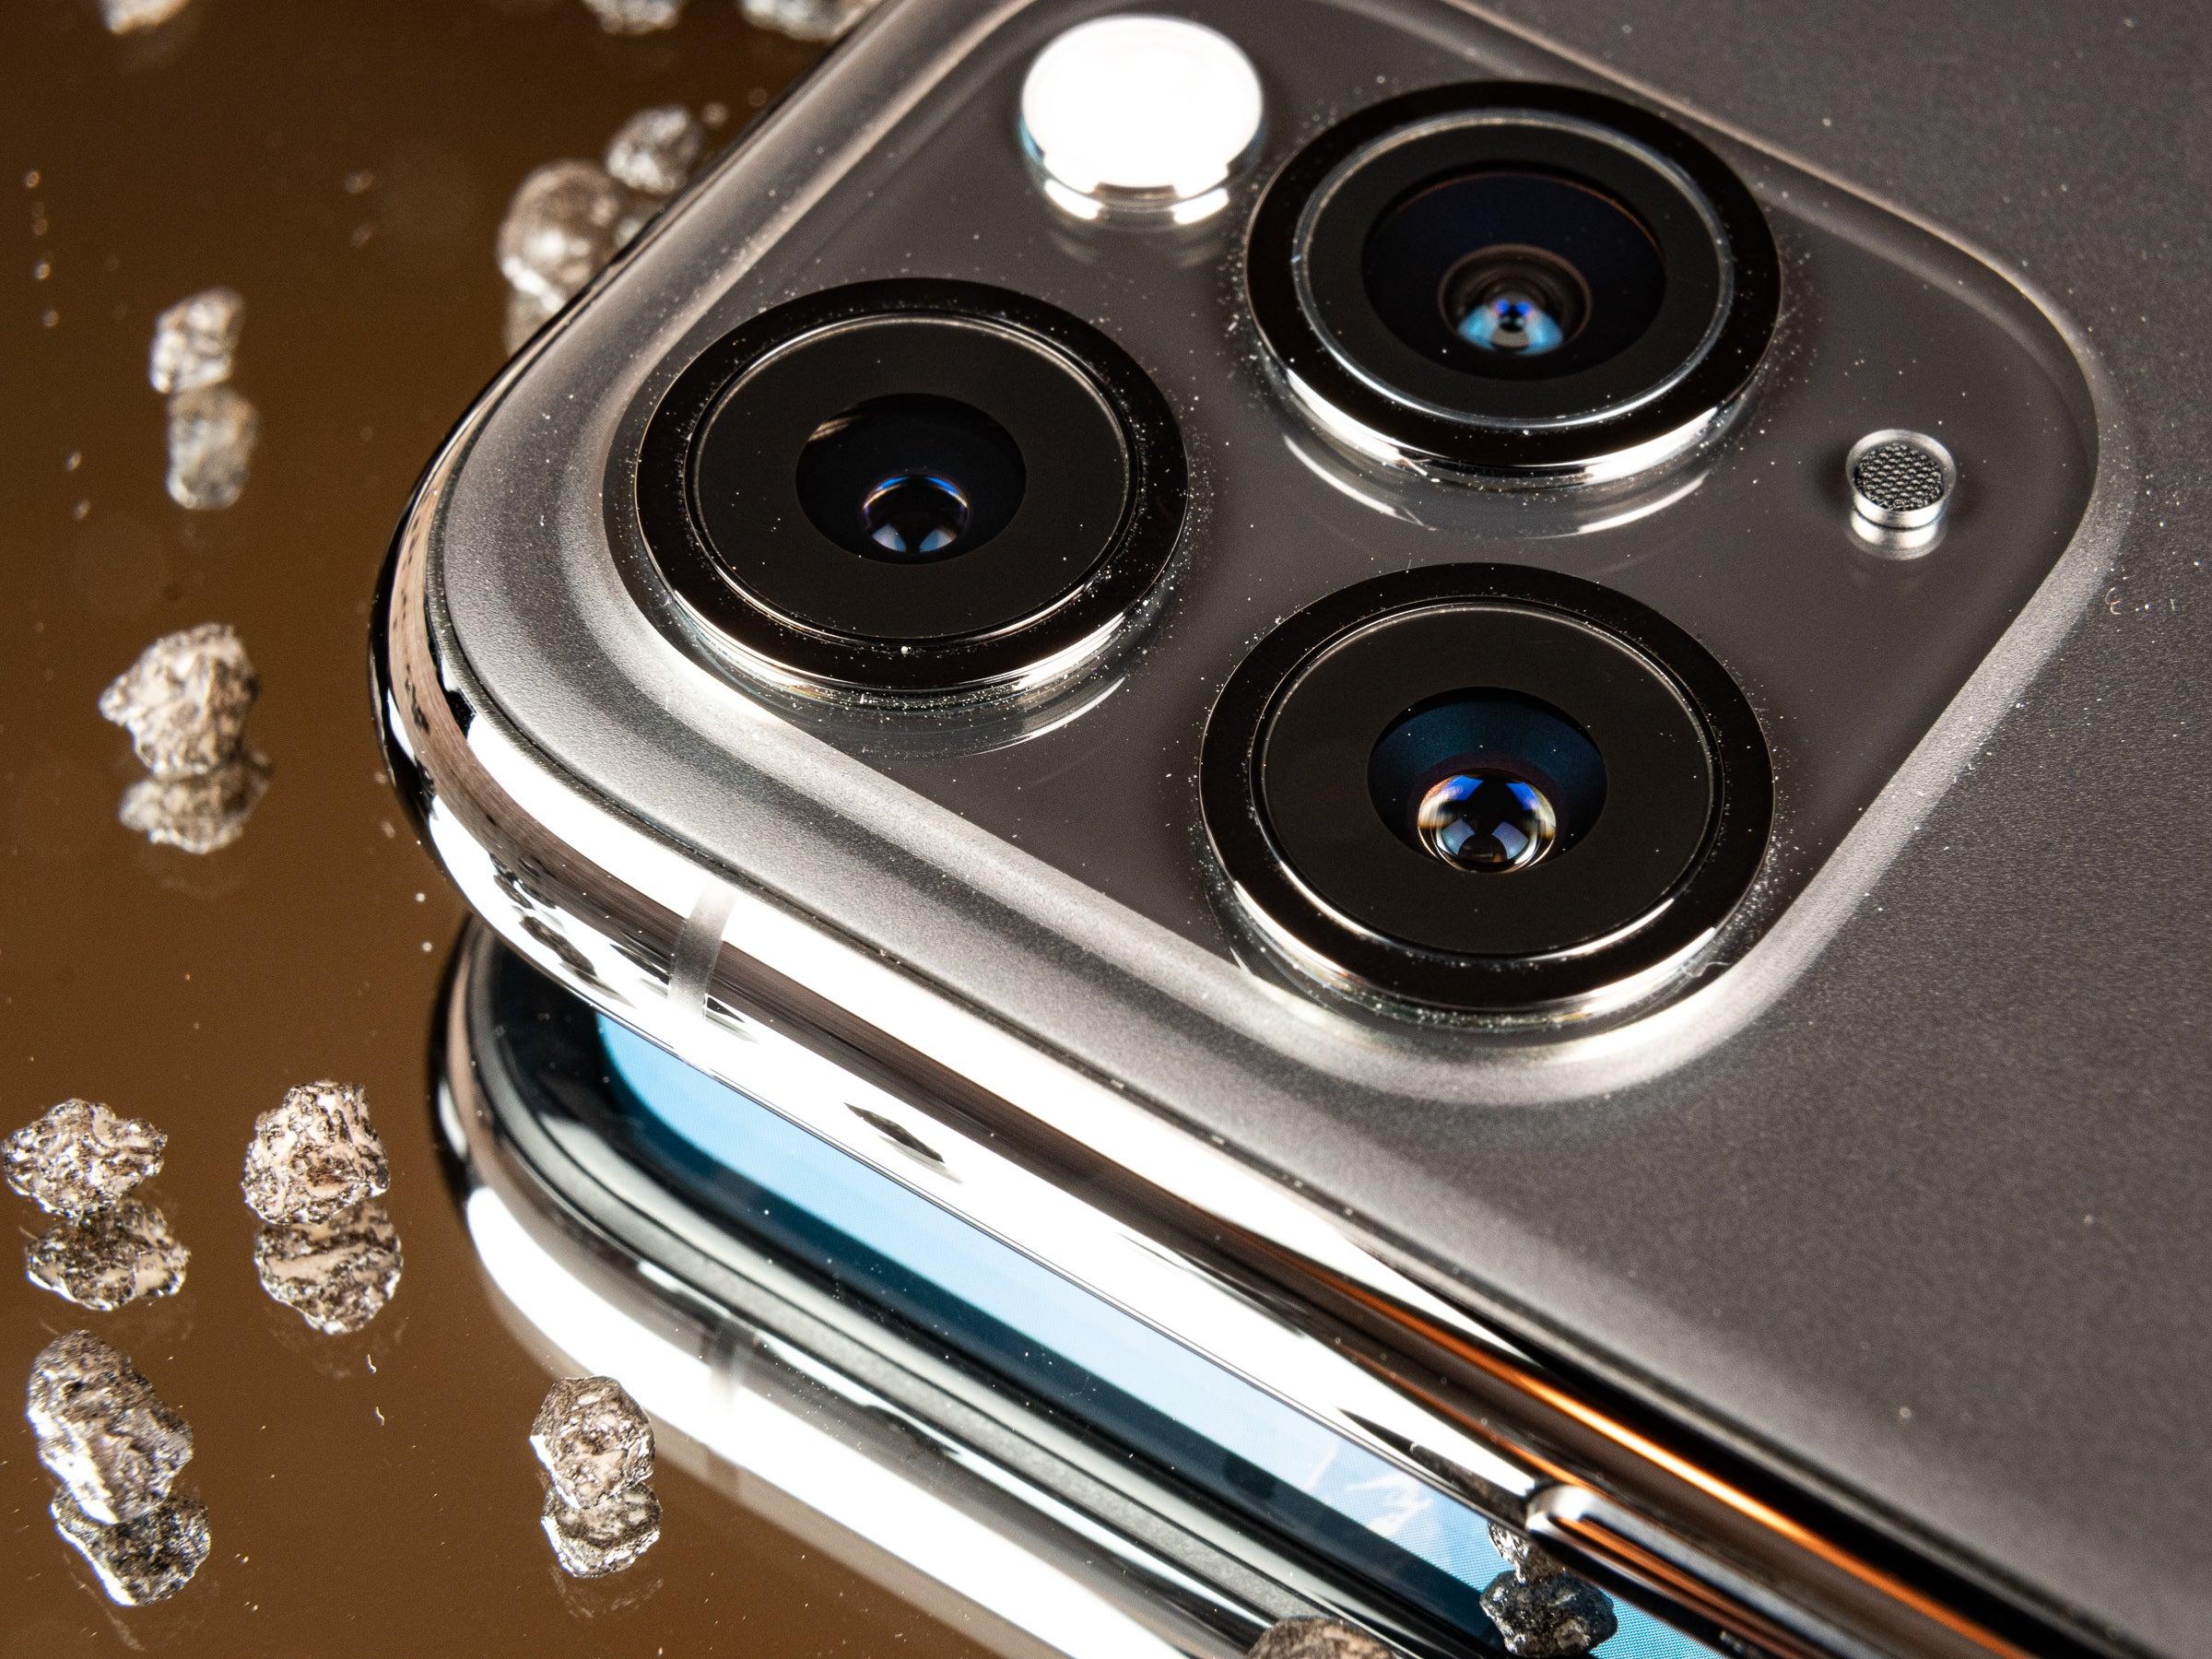 Kamera des Apple iPhone 11 Pro